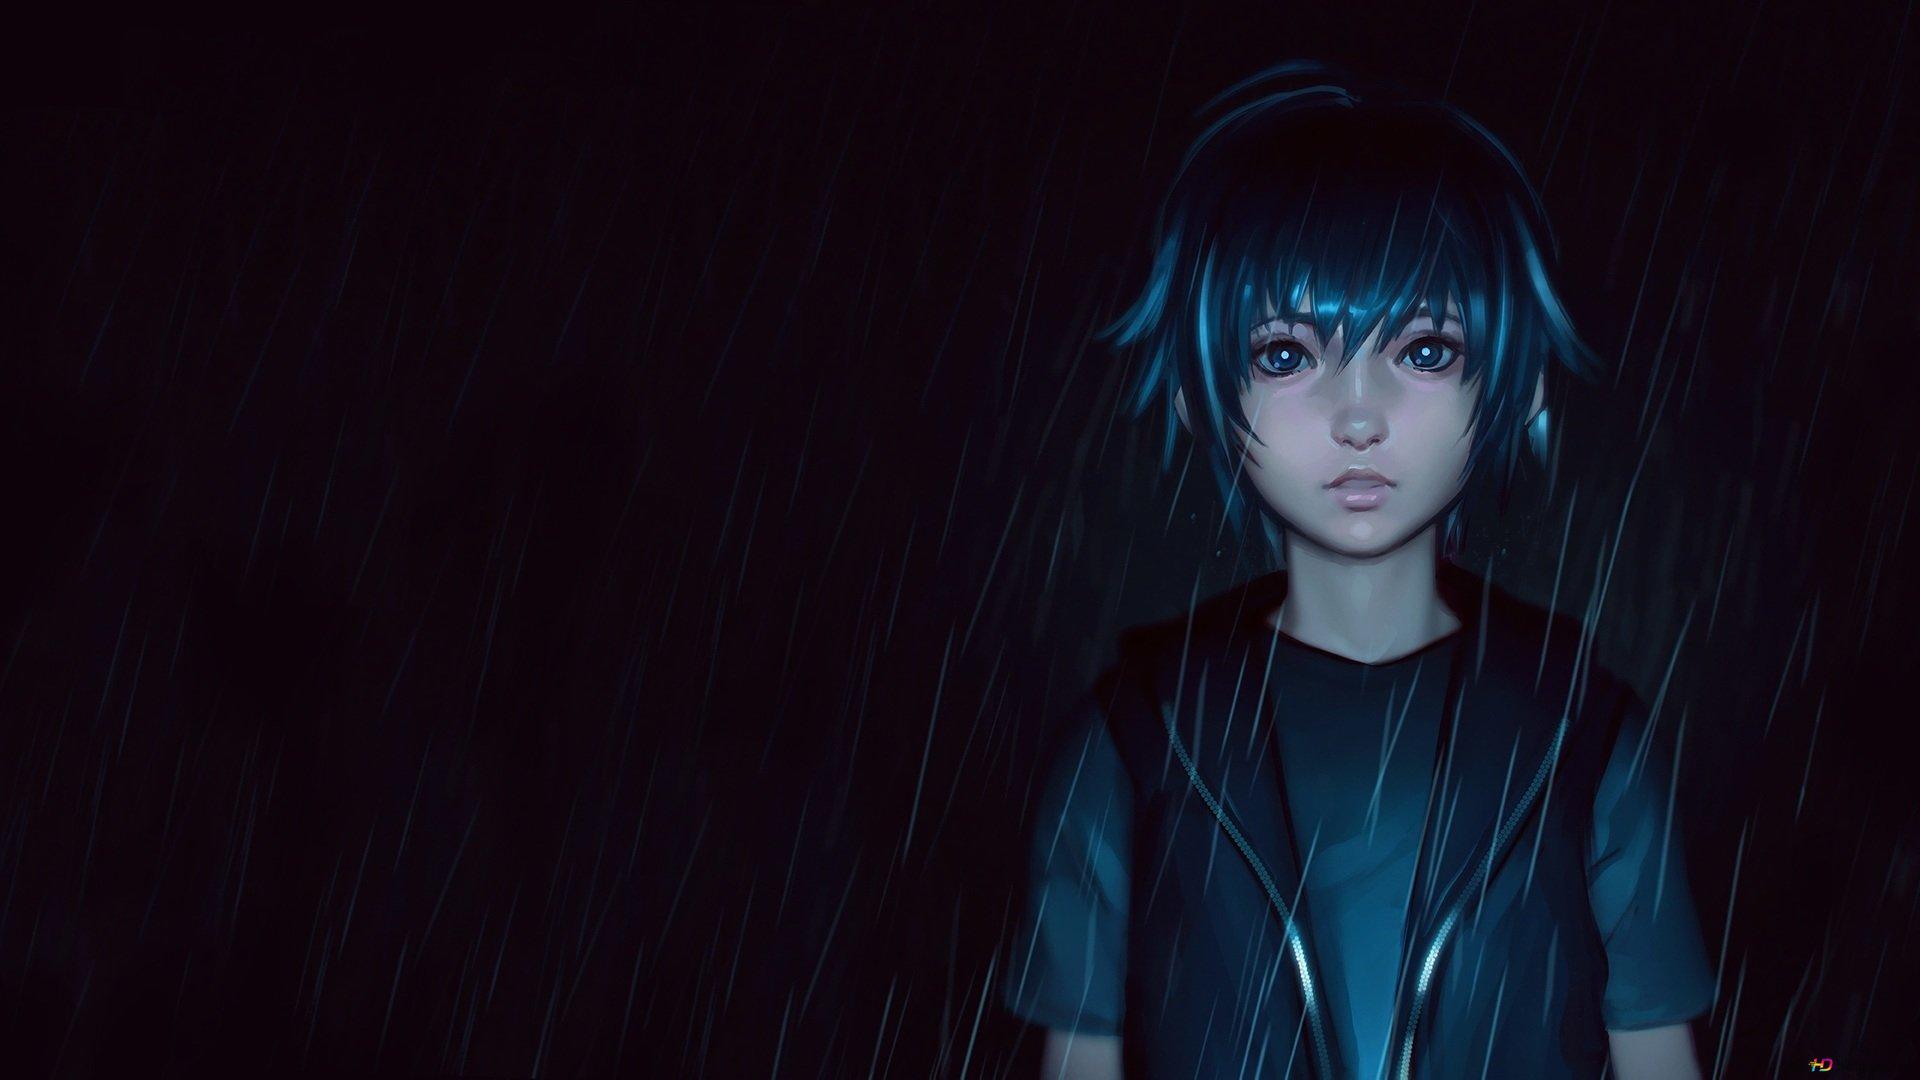 Final Fantasy 15 Noctis Lucis Caelum 3d Hd Wallpaper Download